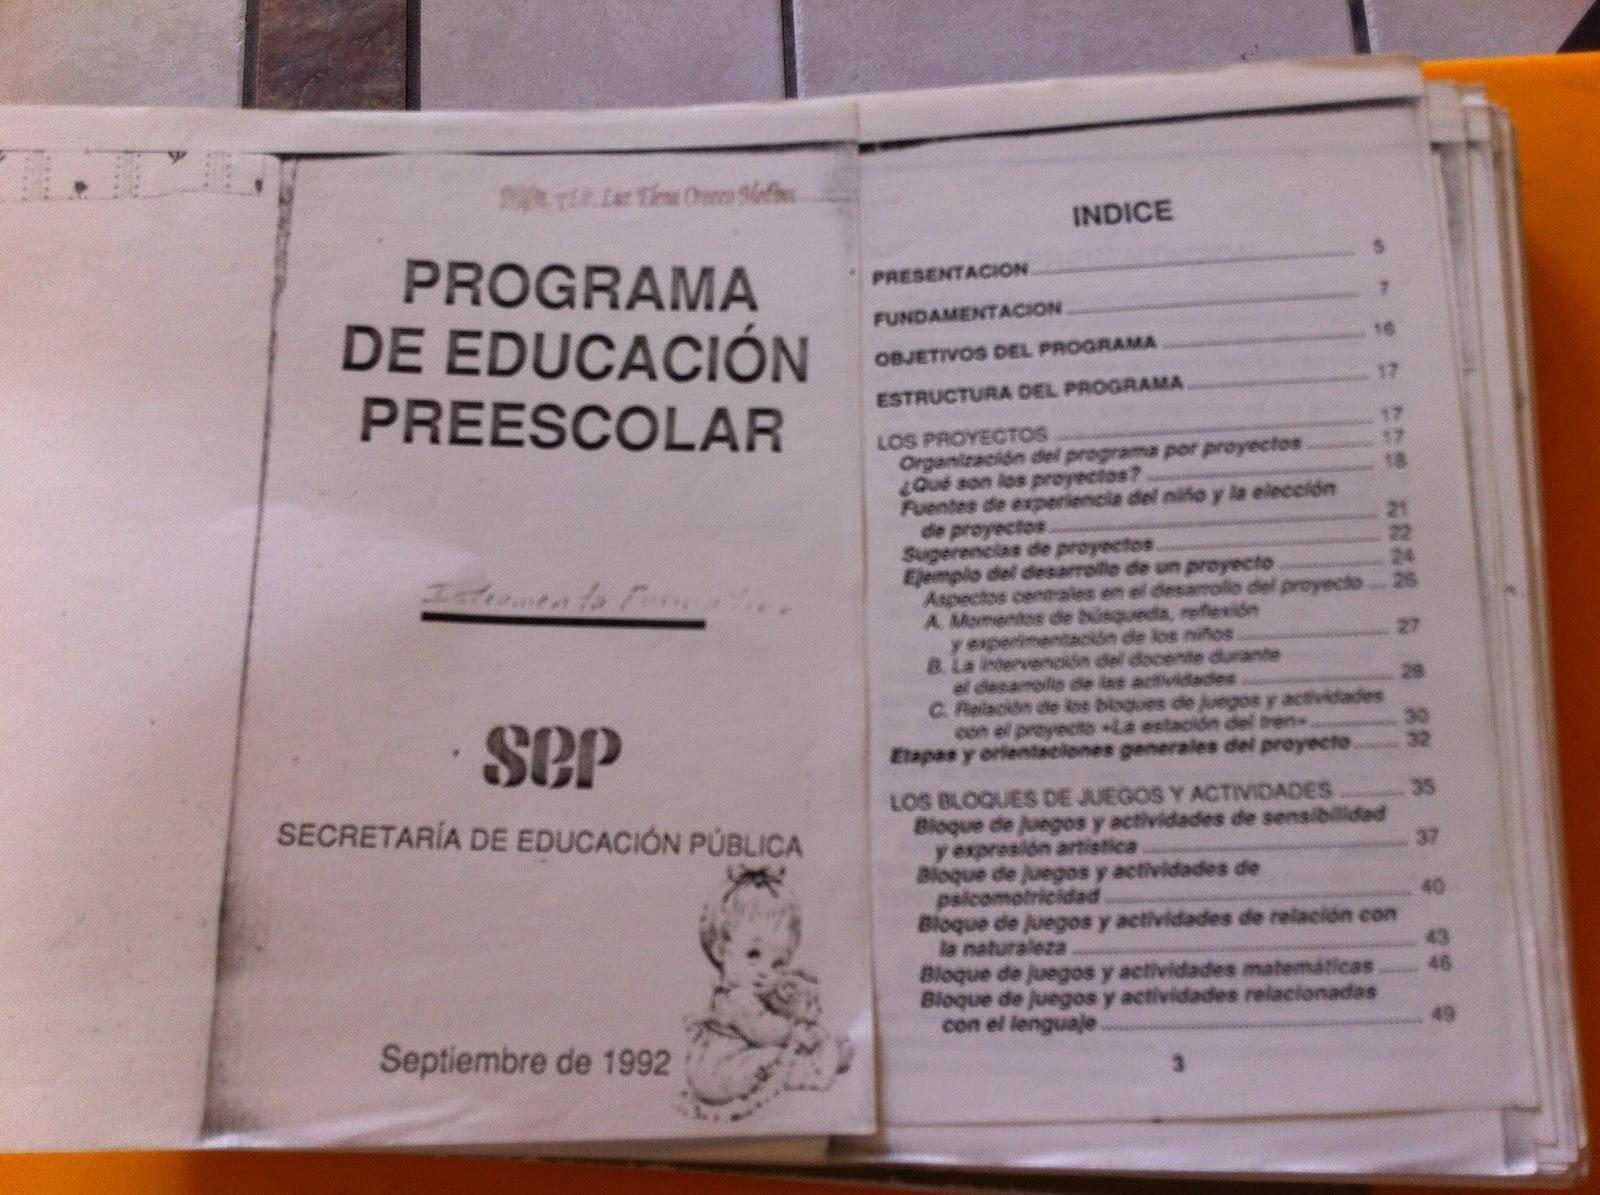 Pep 1992 Preescolar Pdf 14 ileemahal